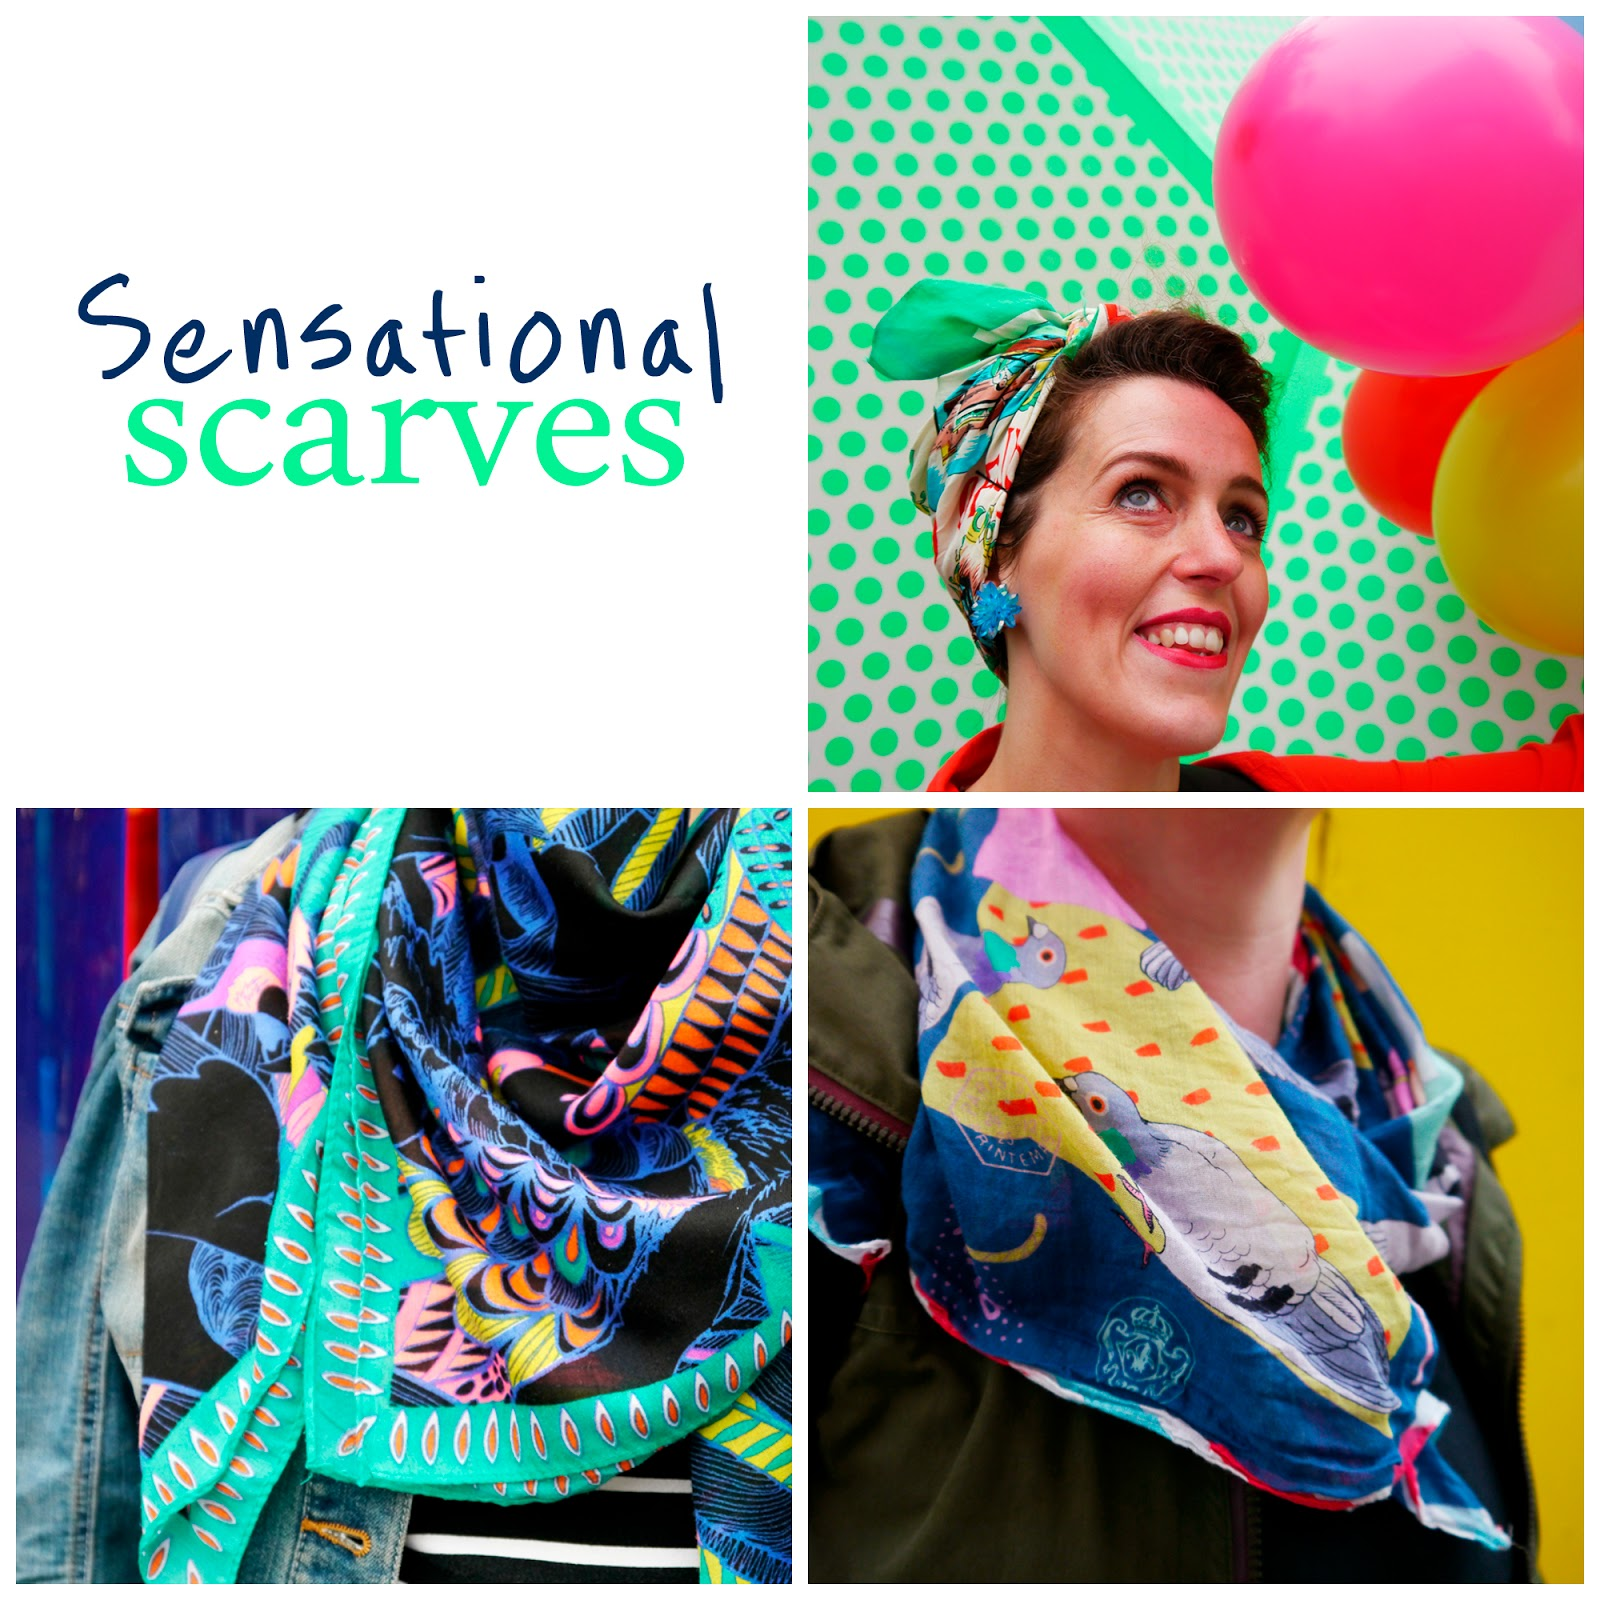 Blogtacualr, photowalk, West Elm Photowalk, London, london style, blogger style, colour, balloons, bloggers, #blogtacular, #westelmlondonscenes, West Elm London Scenes, style spotting, scarf style, scarf addict, Karen Mabon